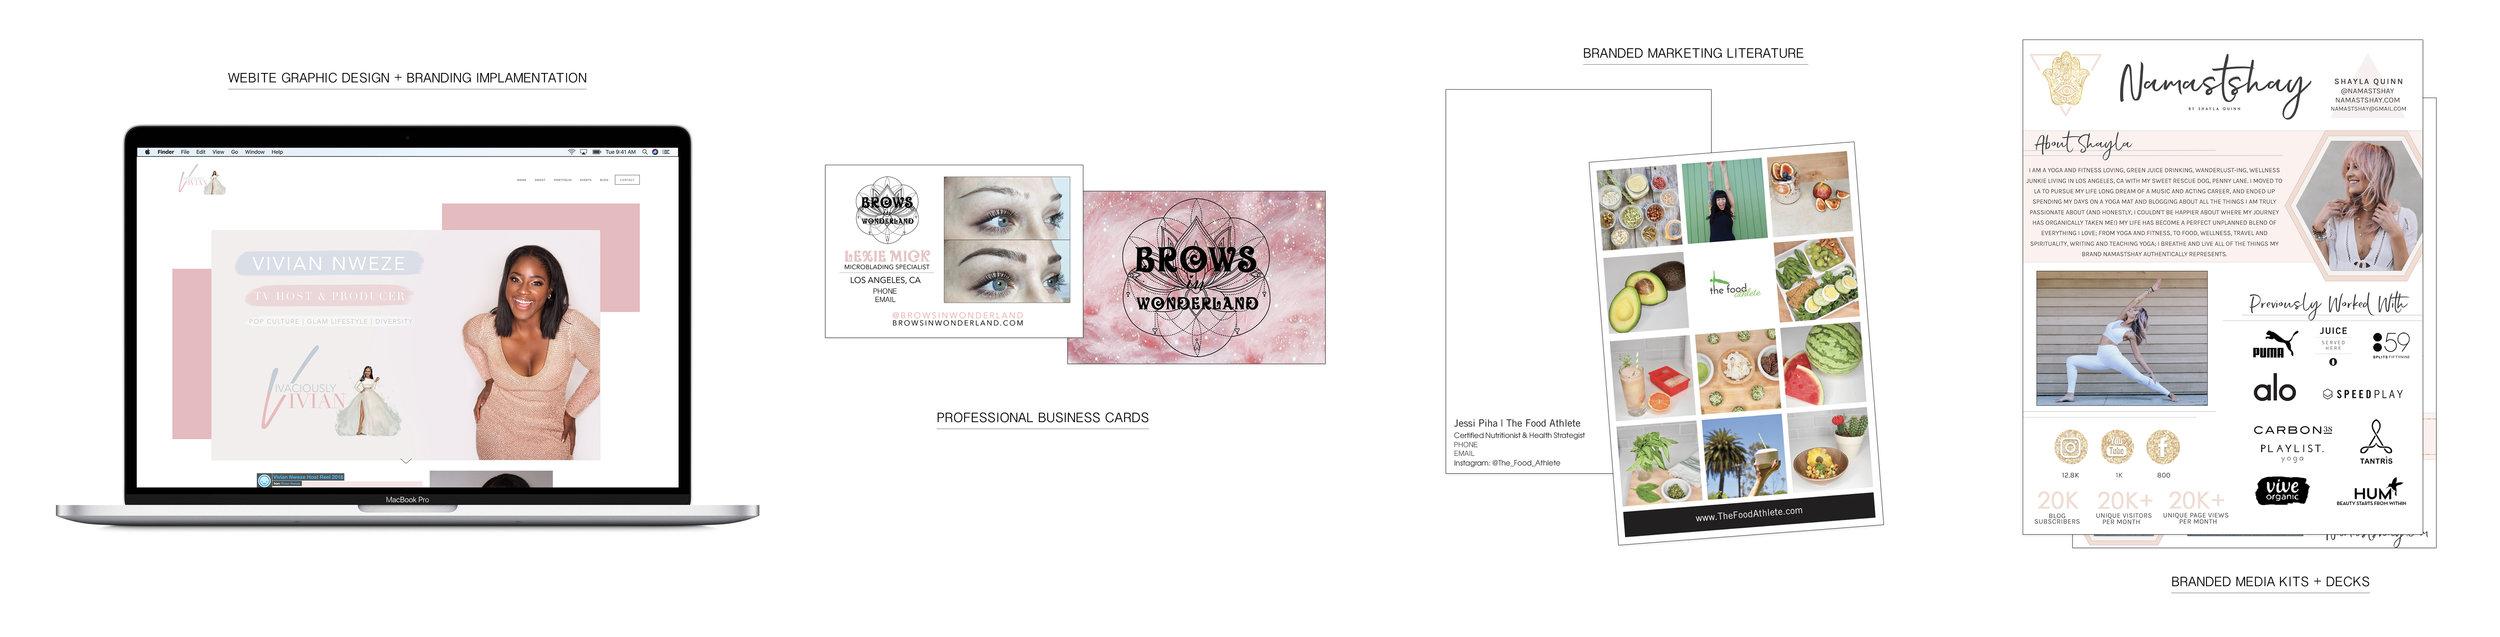 MM branding examples2.jpg